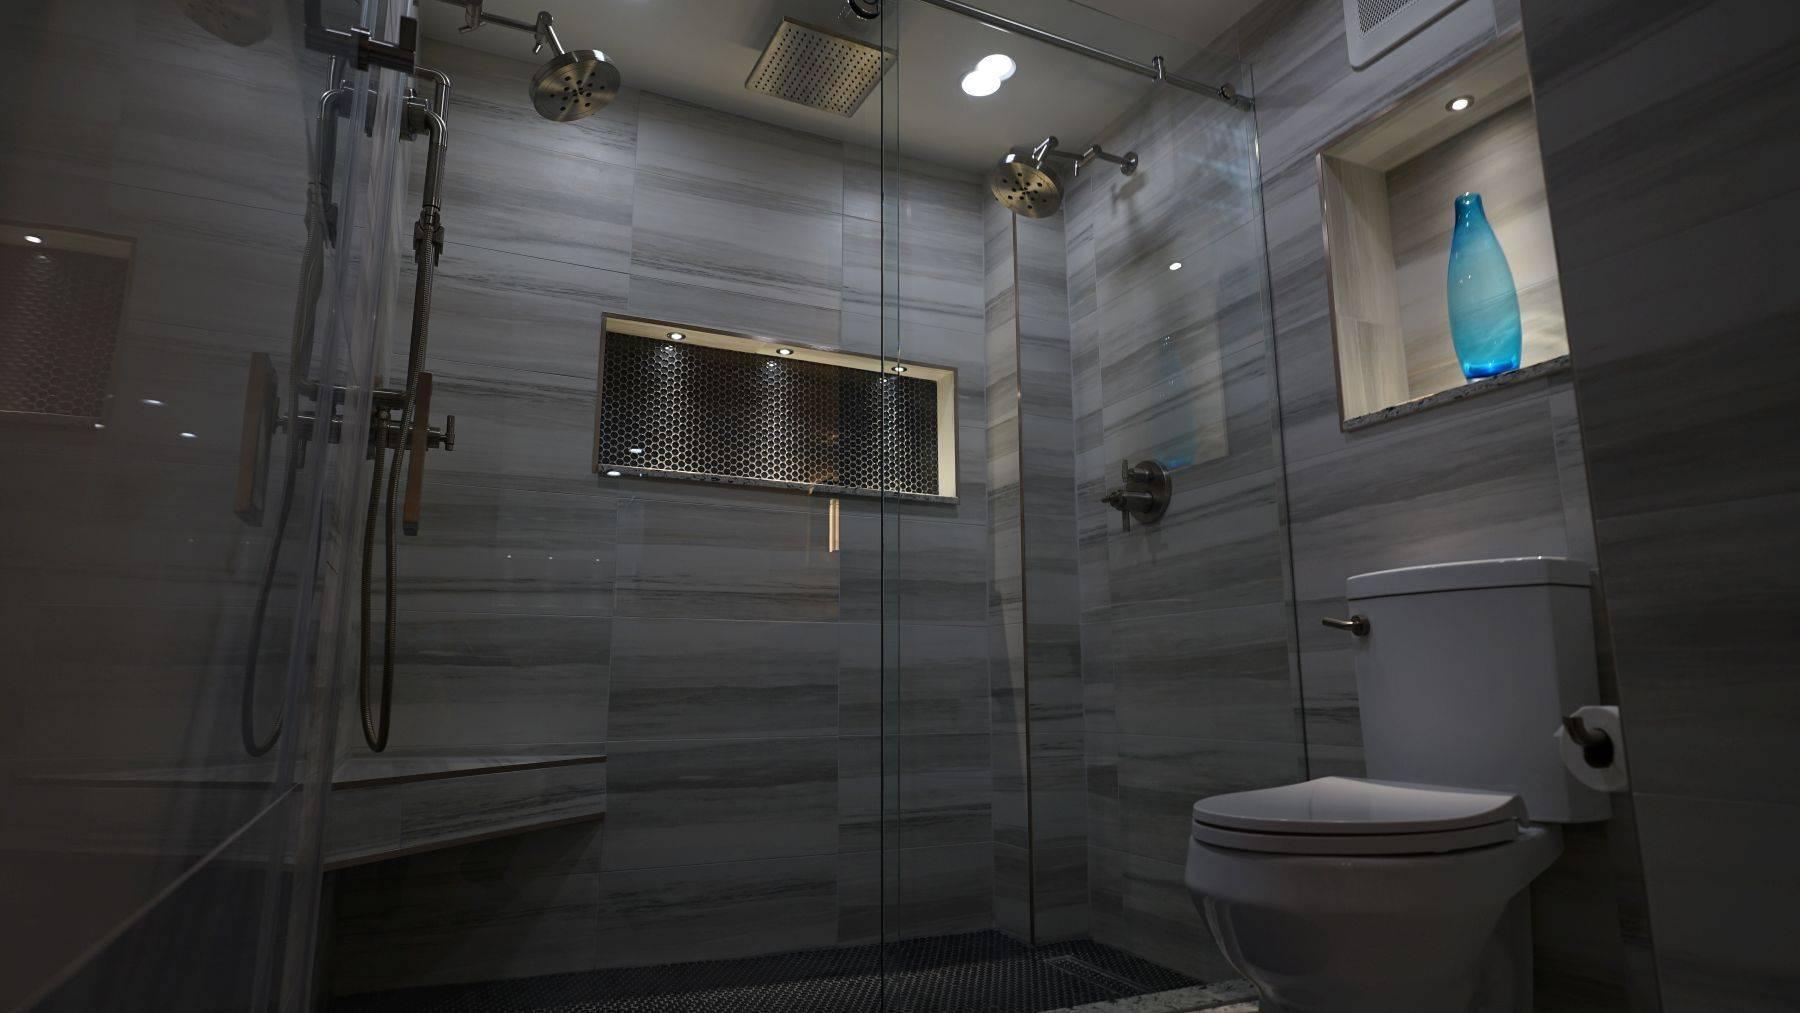 Modern floor to ceiling tiles, inset shower shelving in Bathroom Renovation in Plantation, Florida